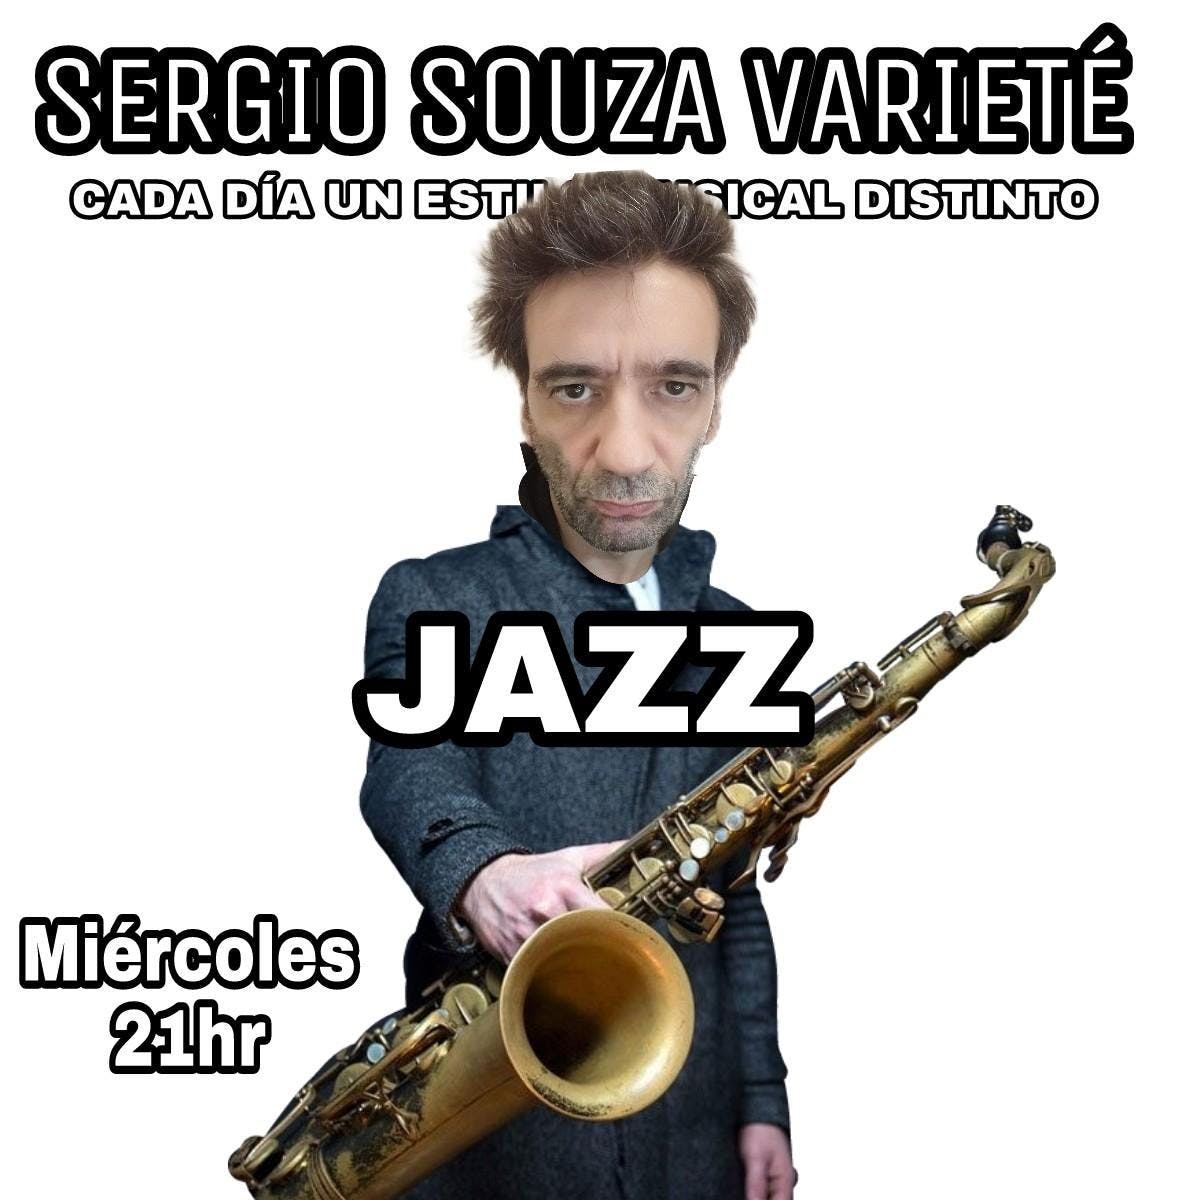 Sergio Souza Variete Jazz